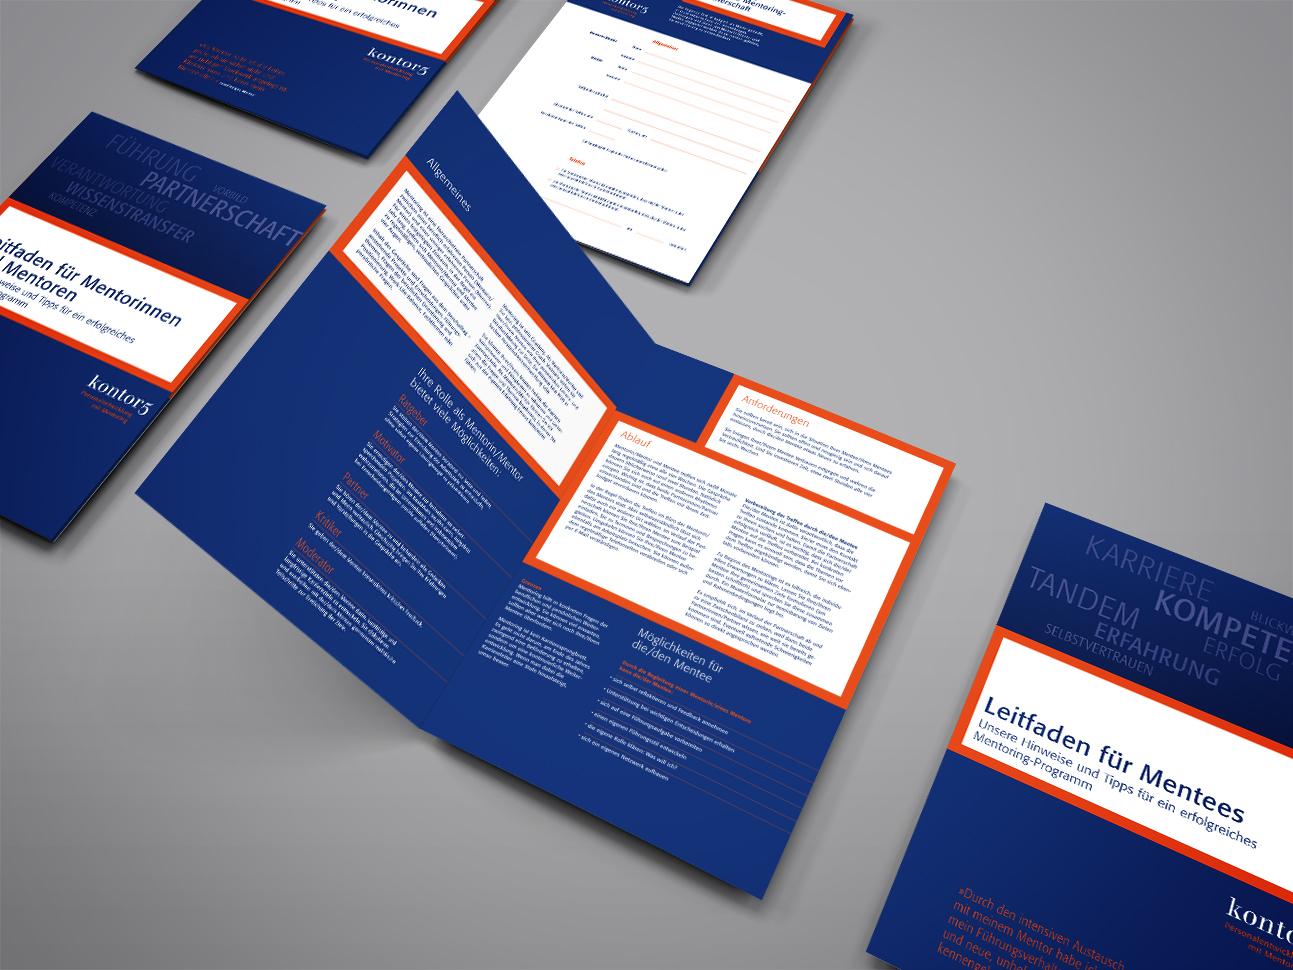 martin_zech_design_corporate_design_kontor5_formulare